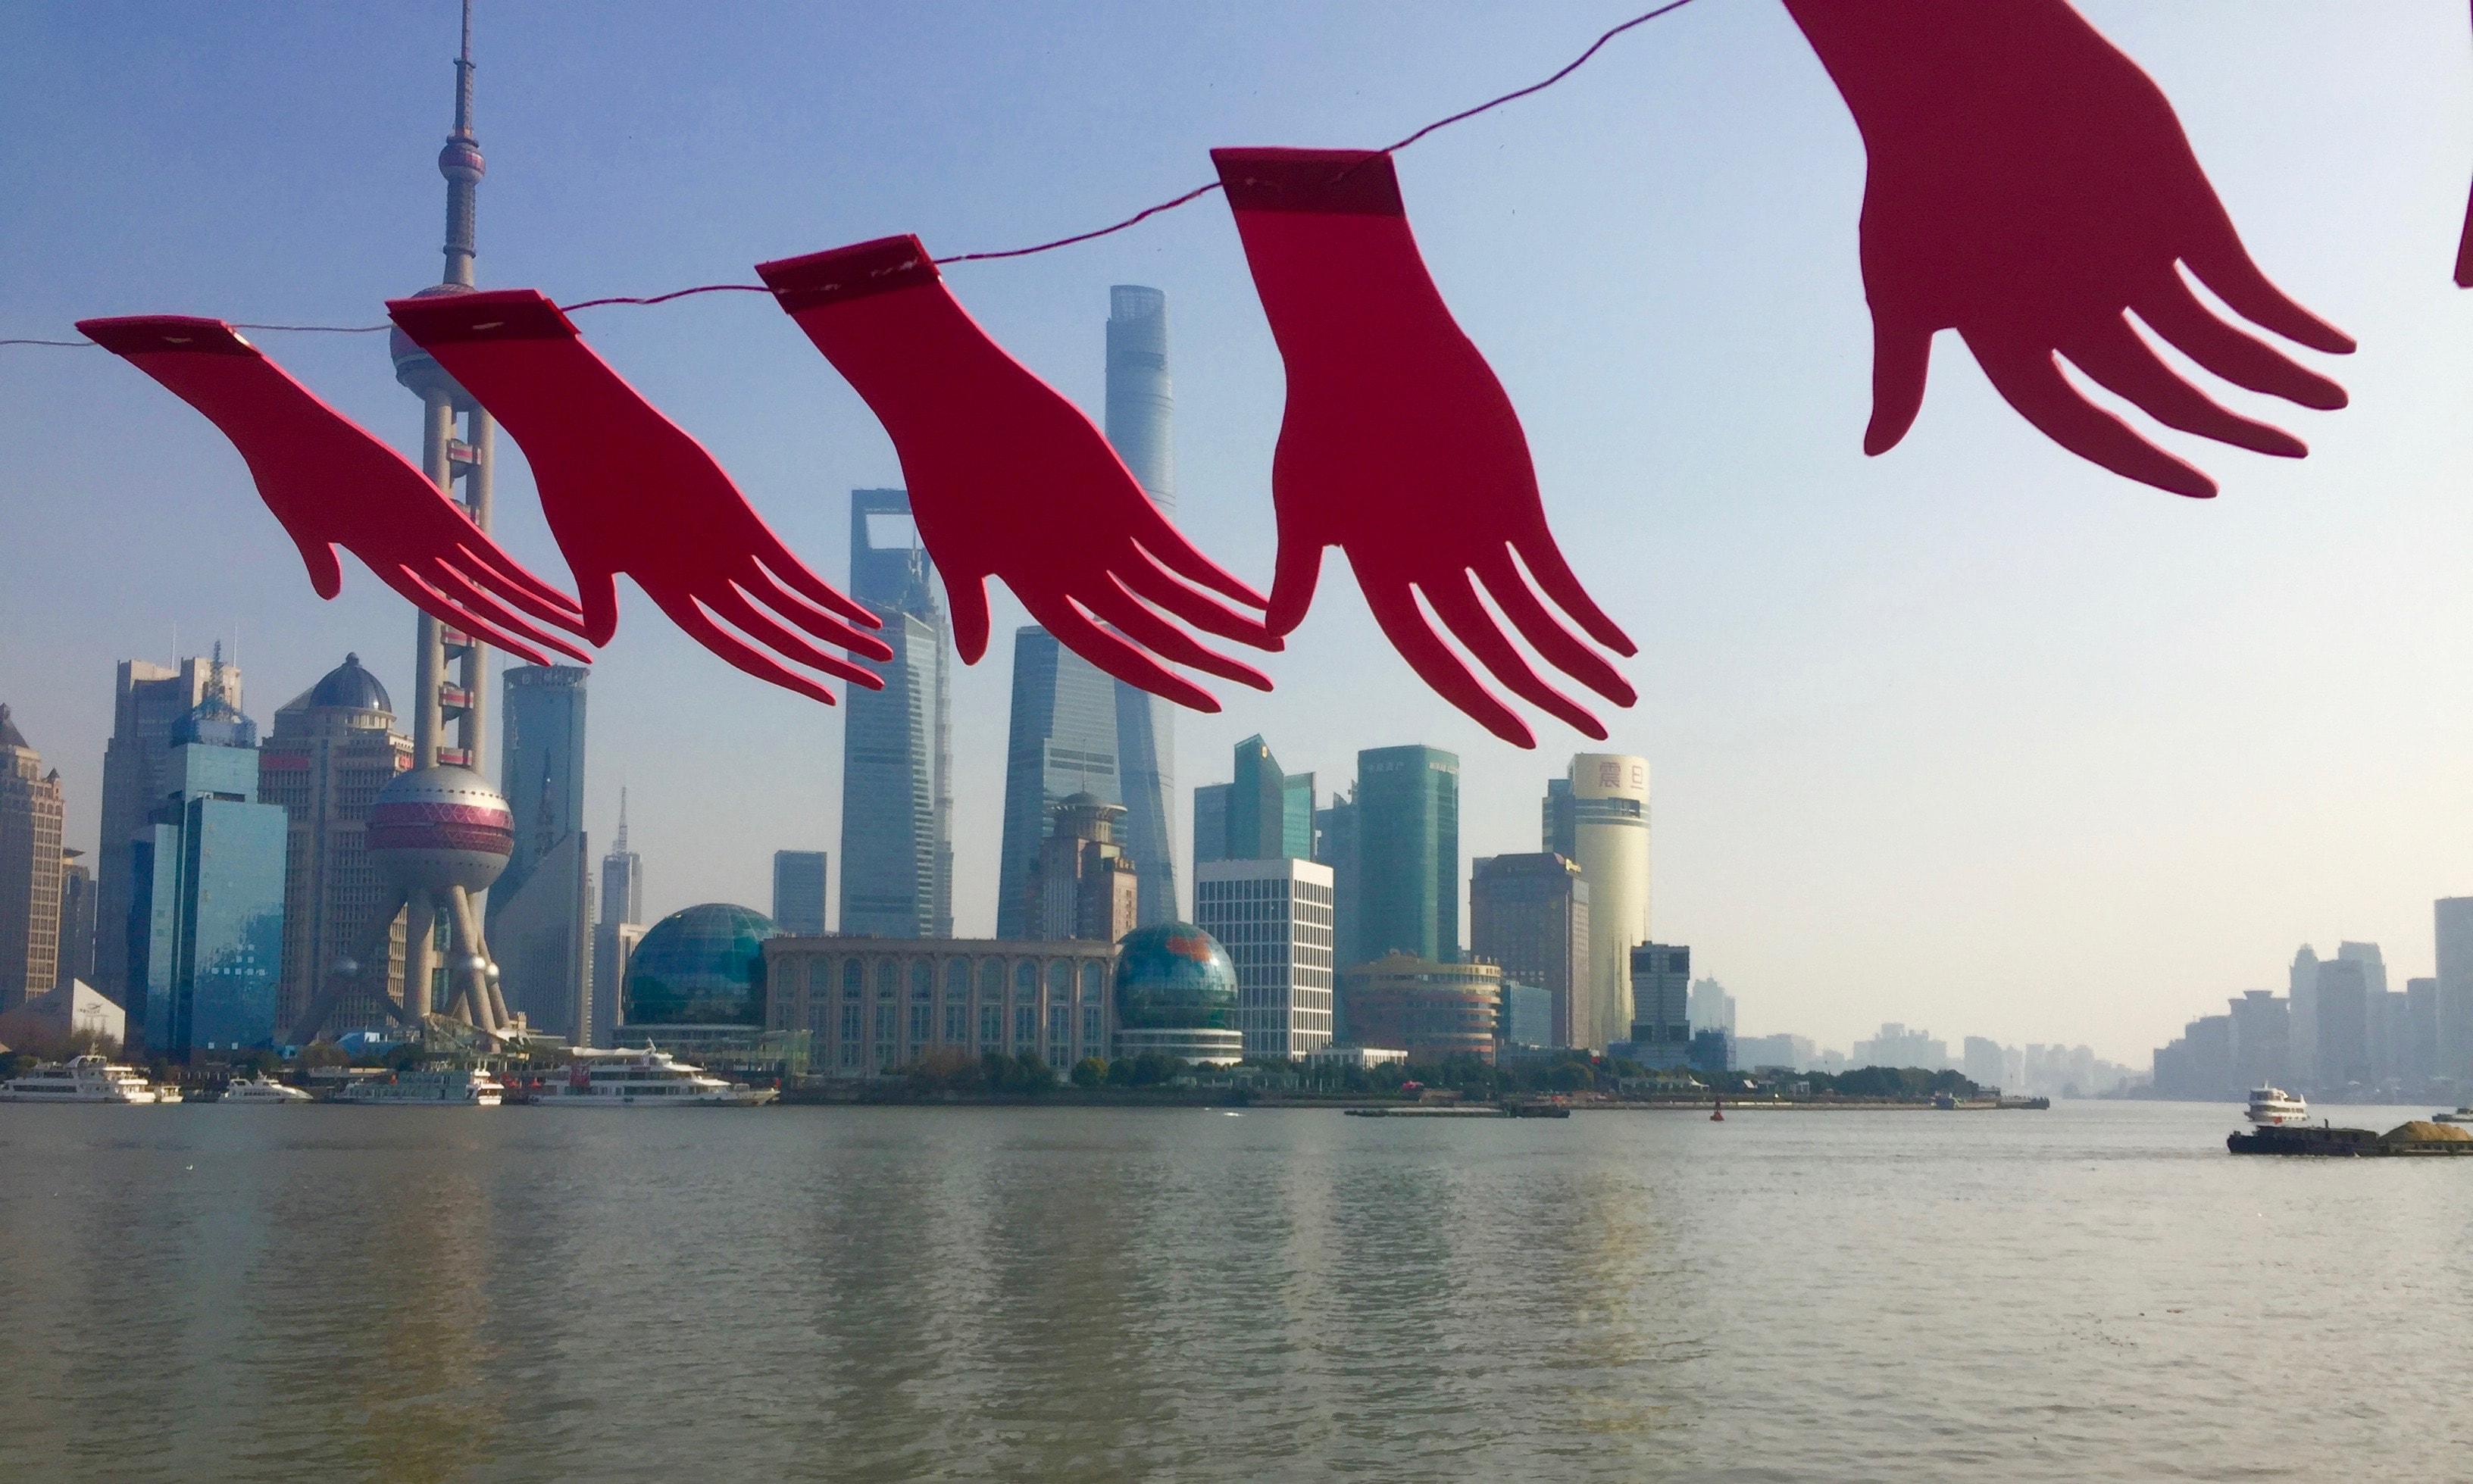 Shanghai - Bund by Barbara Bedin